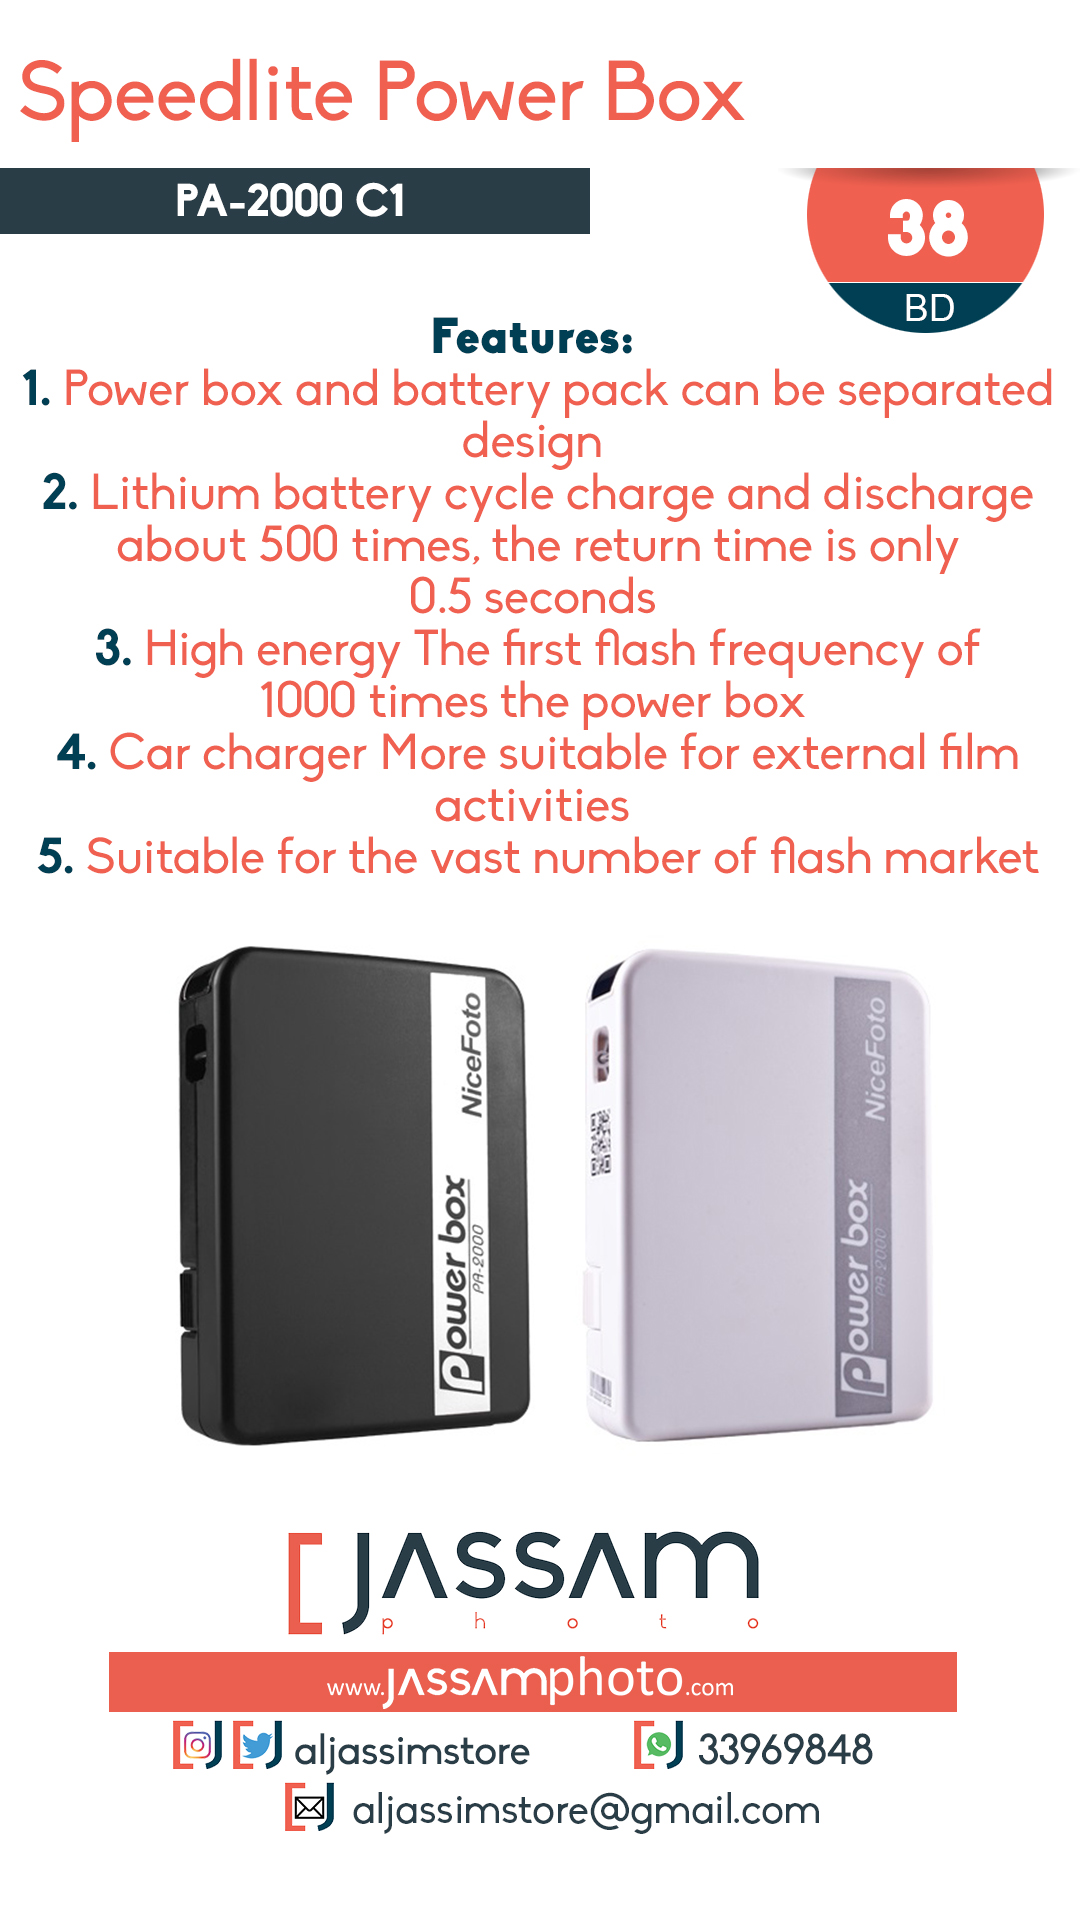 Speedlit Power Box